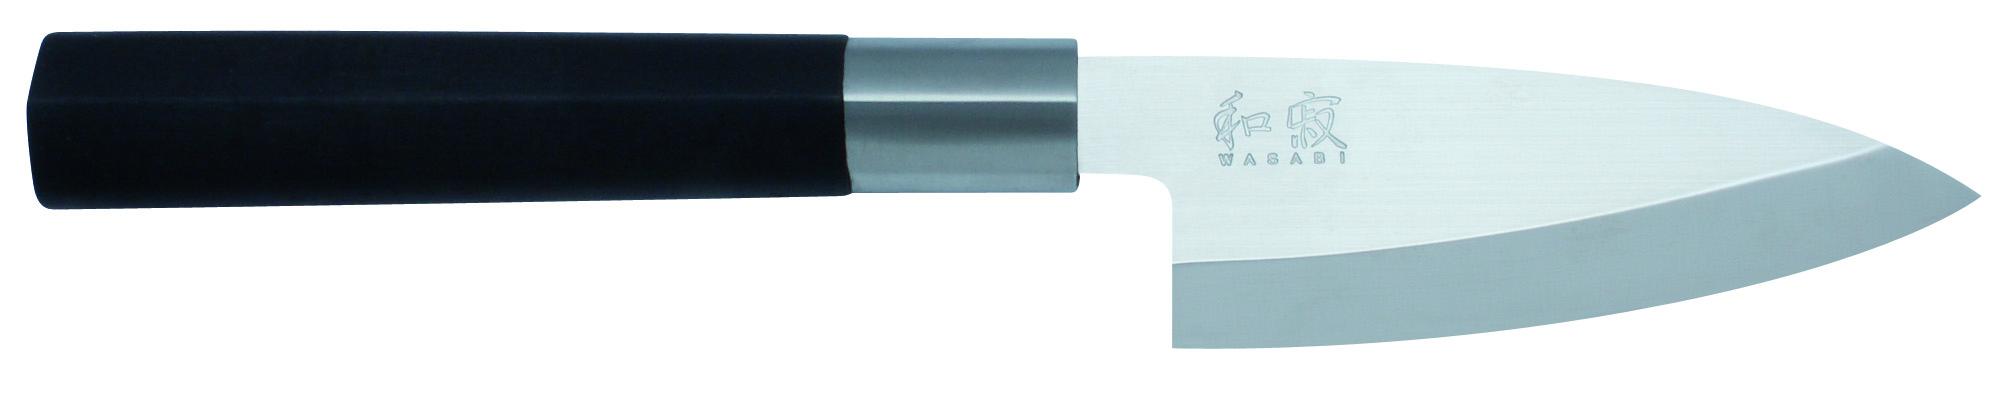 KAI Wasabi Black Debakniv 10,5 cm